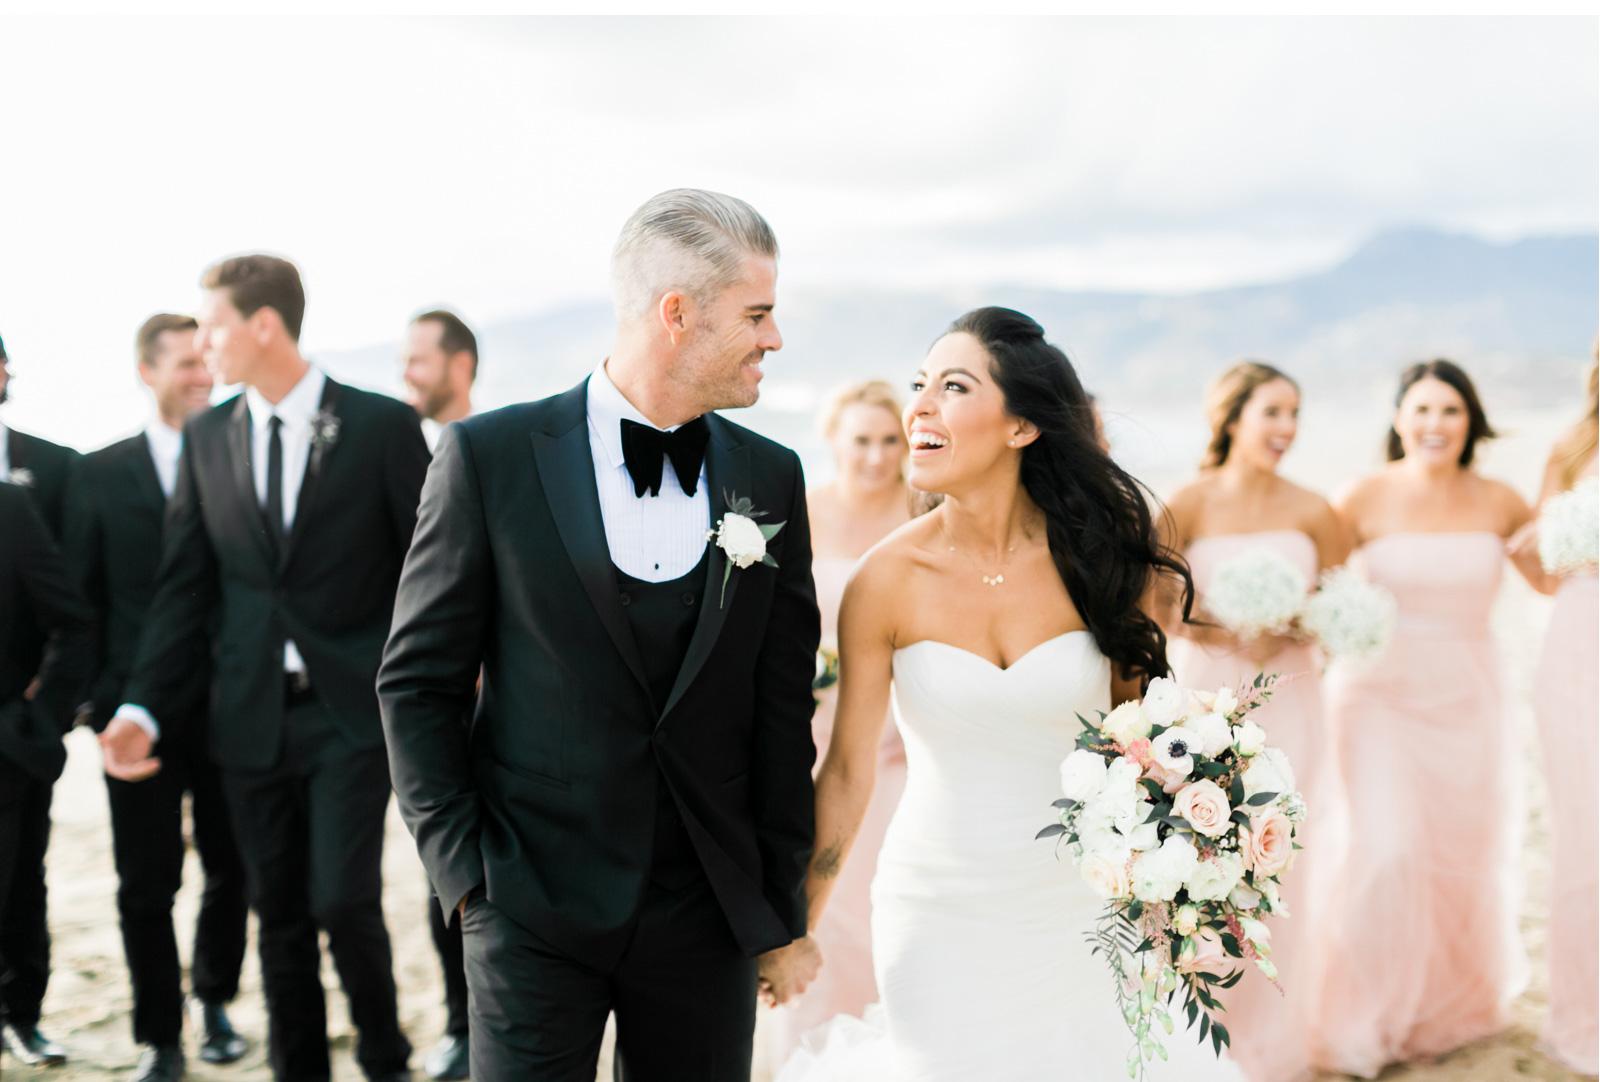 Rod-and-Lorin-Brewster-Style-Me-Pretty-Malibu-Beach-Wedding-Natalie-Schutt-Photography_22.jpg